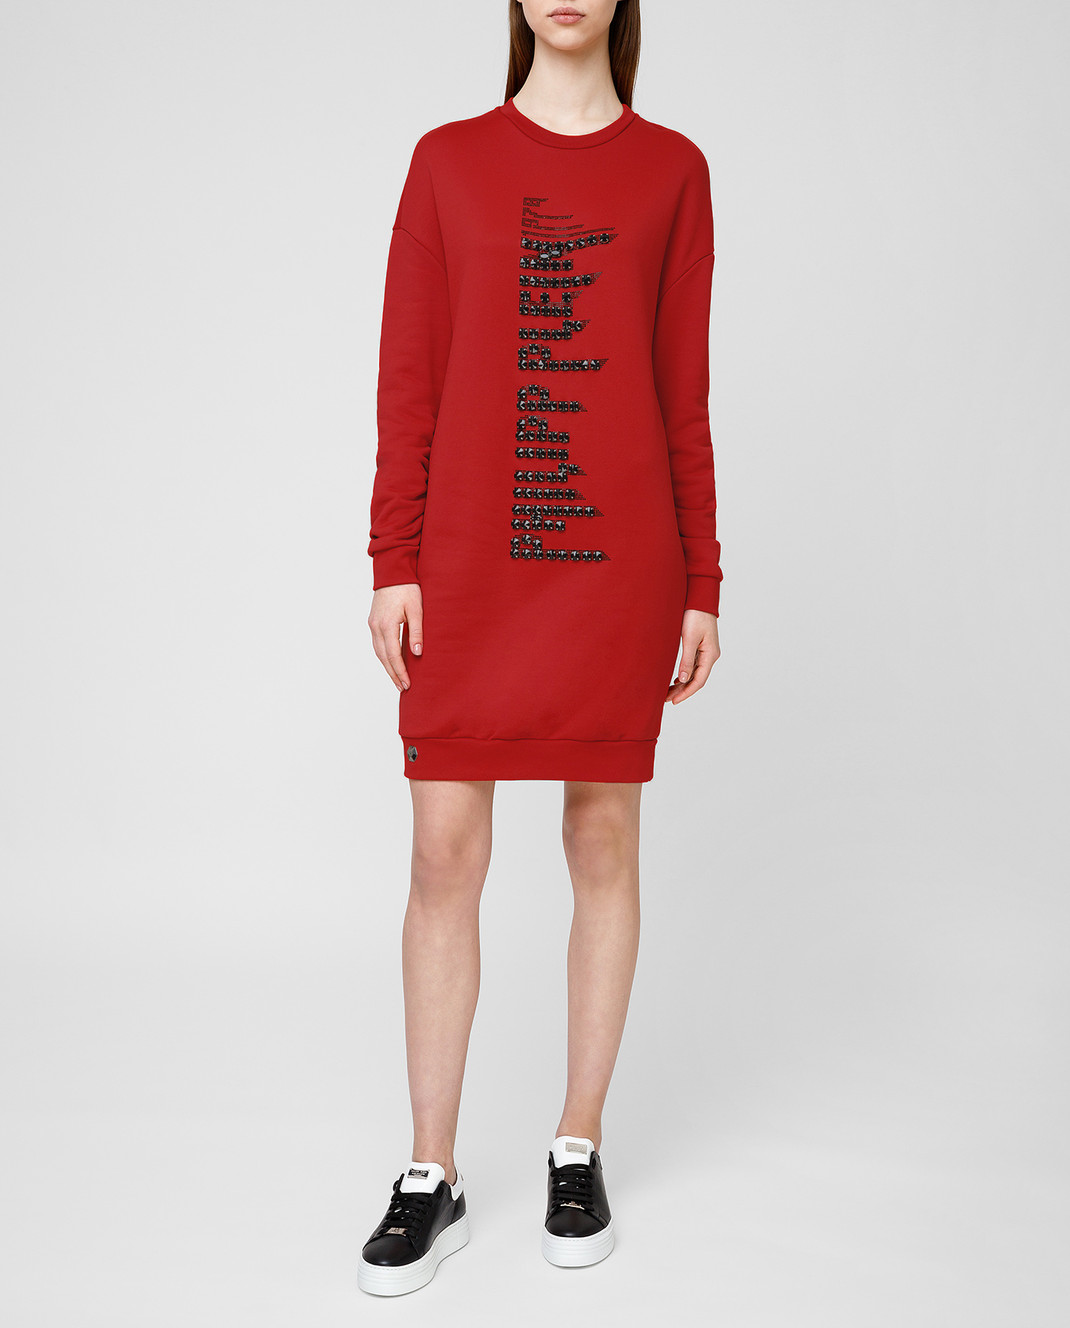 Philipp Plein Красное платье WJO0373 изображение 2